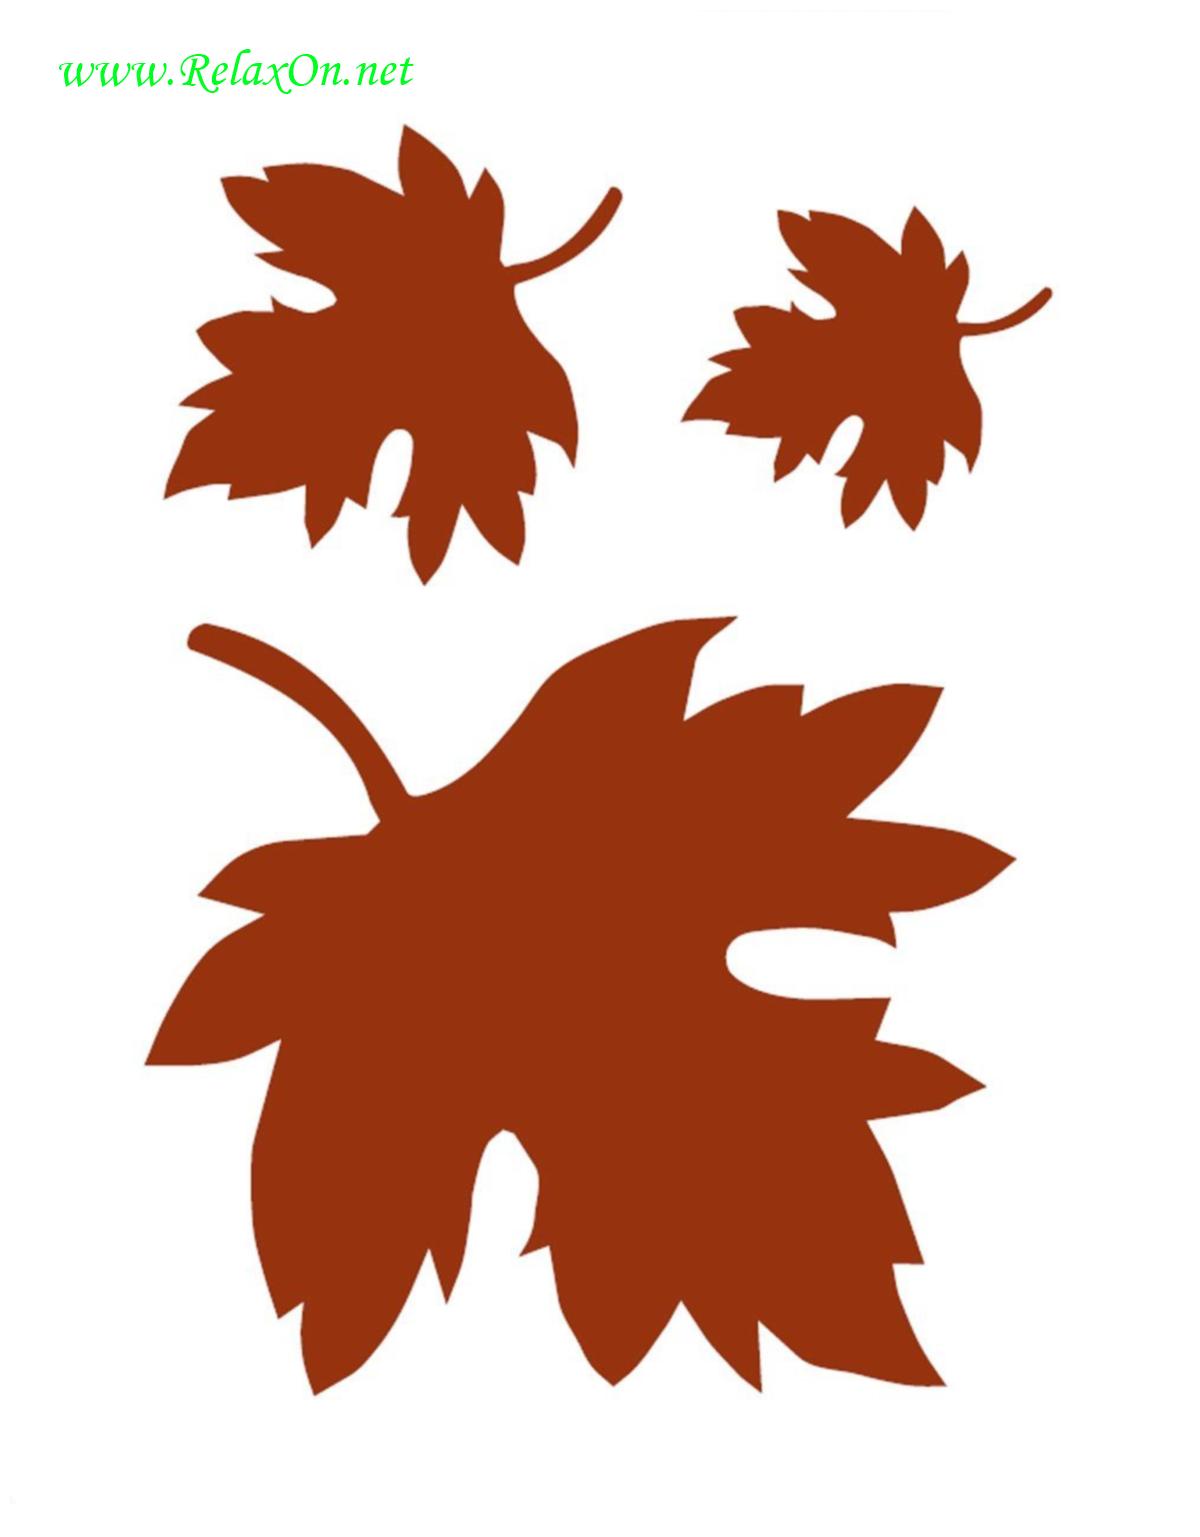 Трафарет листьев клена-1